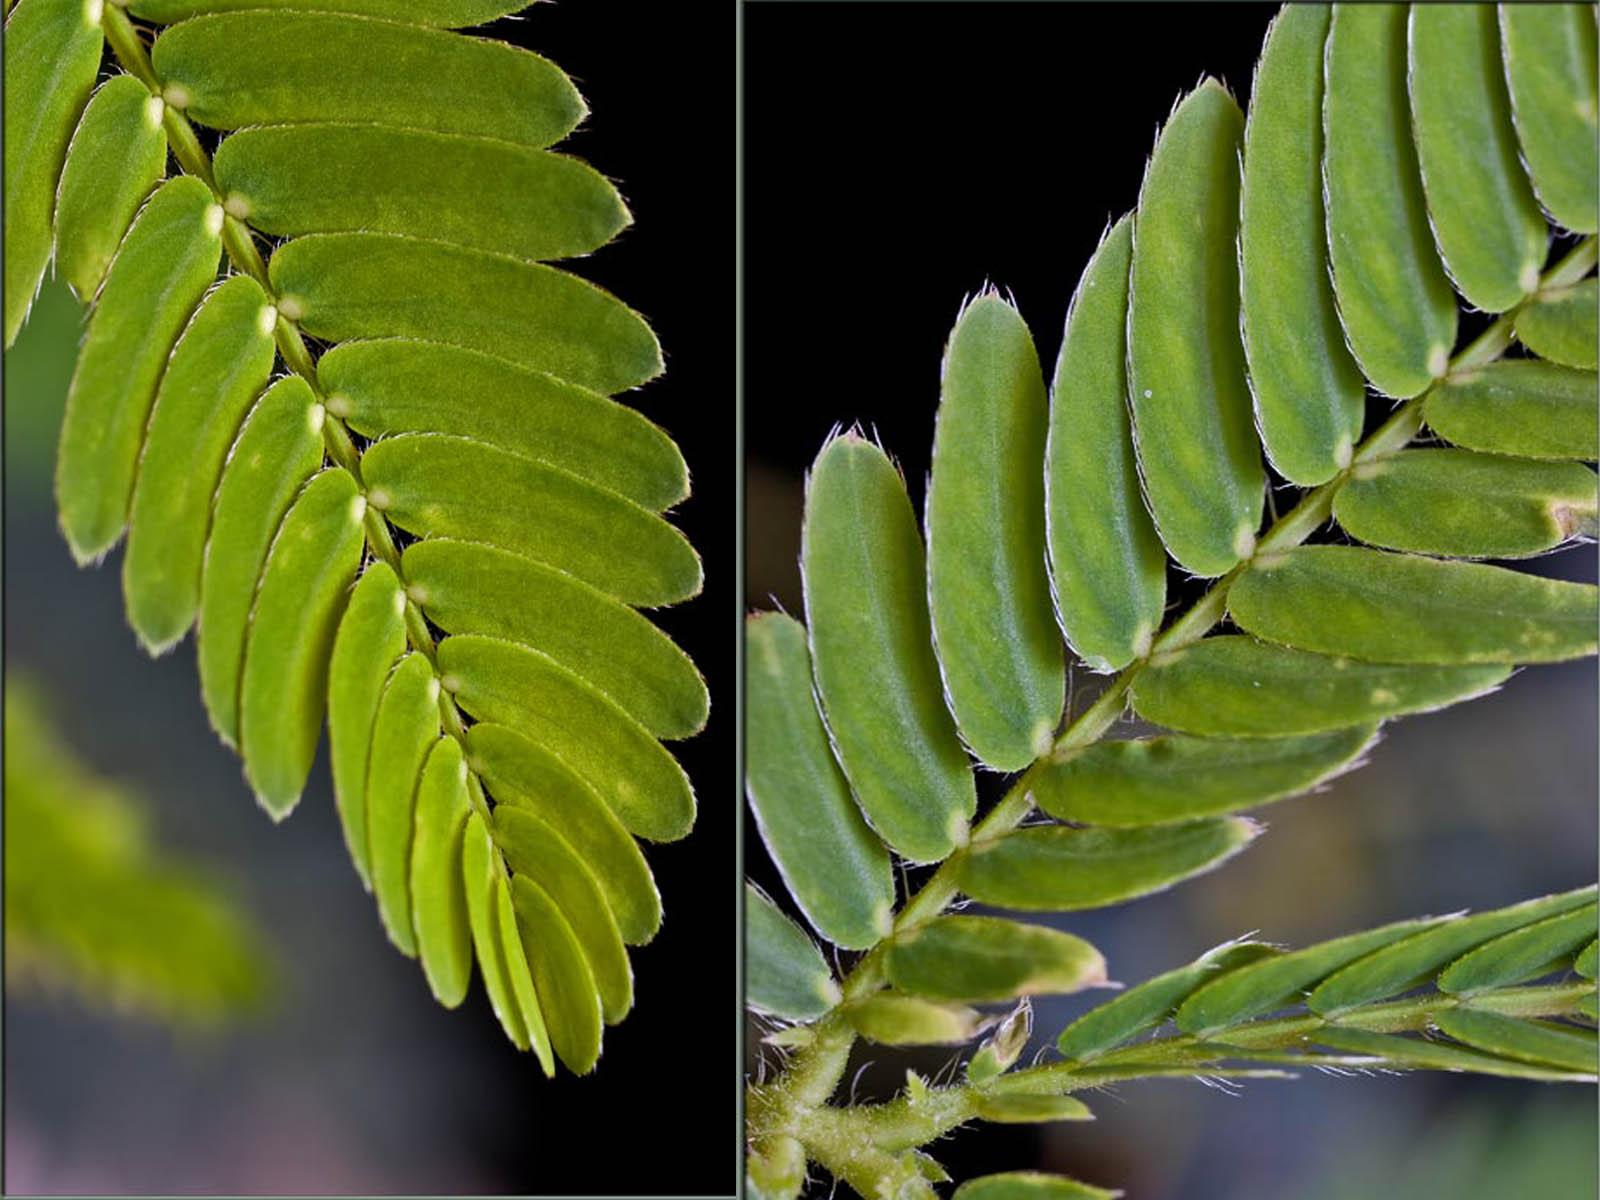 Mimosa Pudica, the Sensitive Plant | akshay